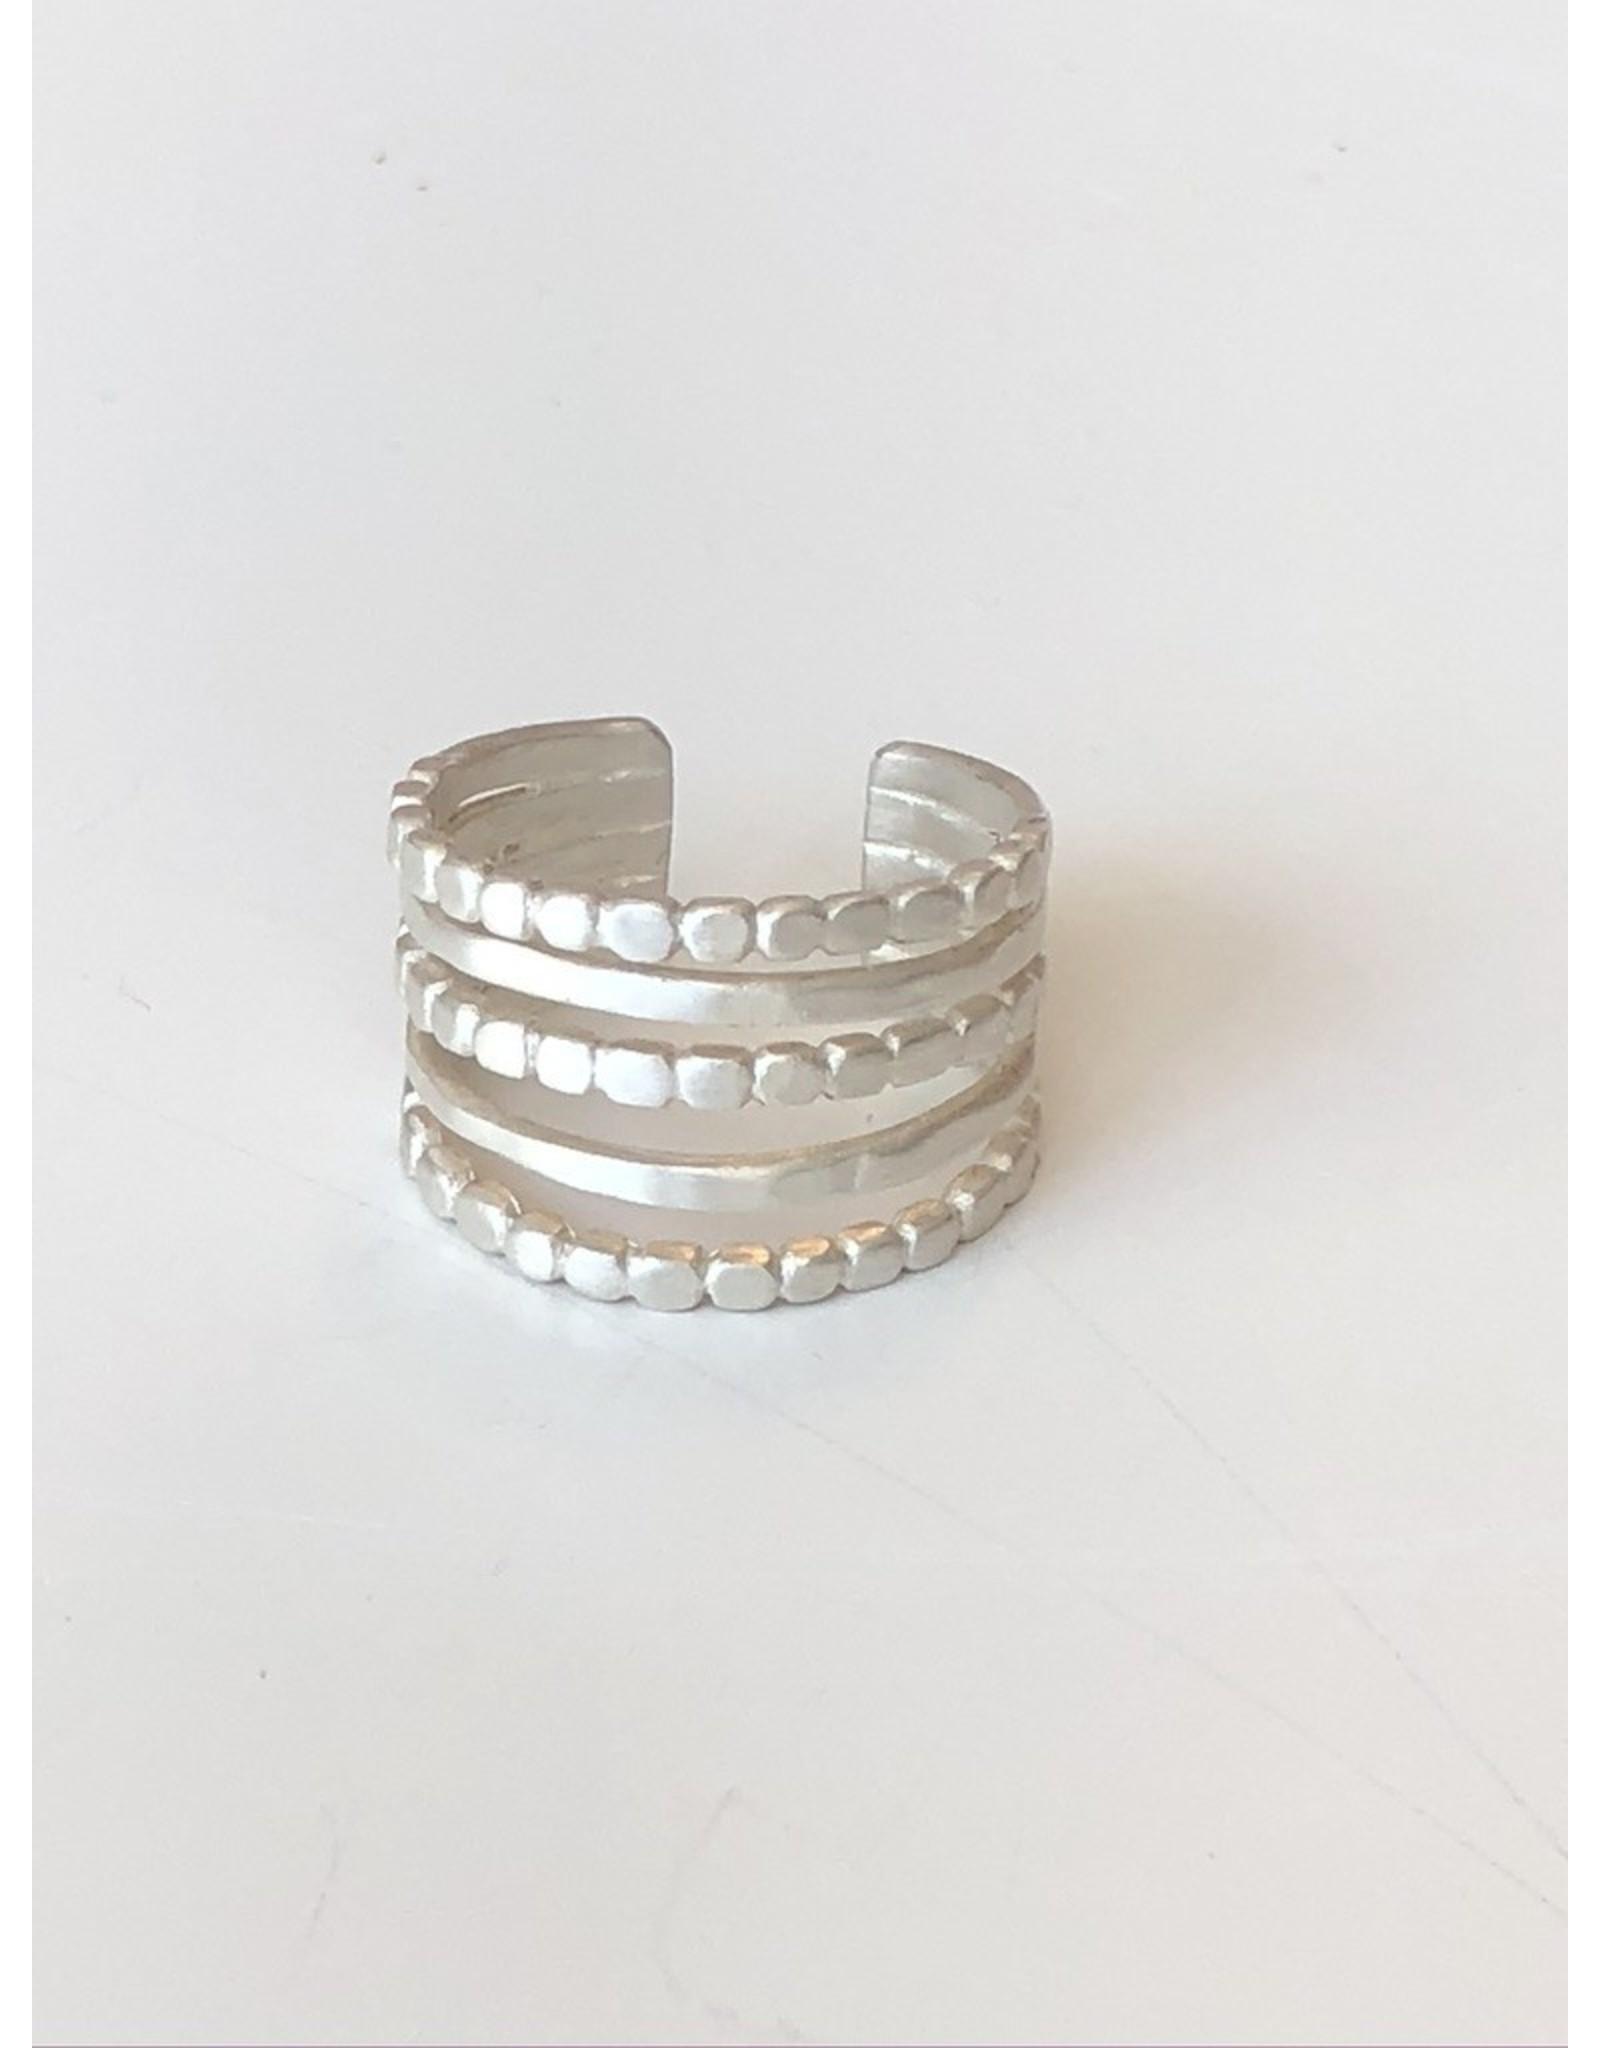 Susi Cala Jewelery Fivefold Misha Ring Silver